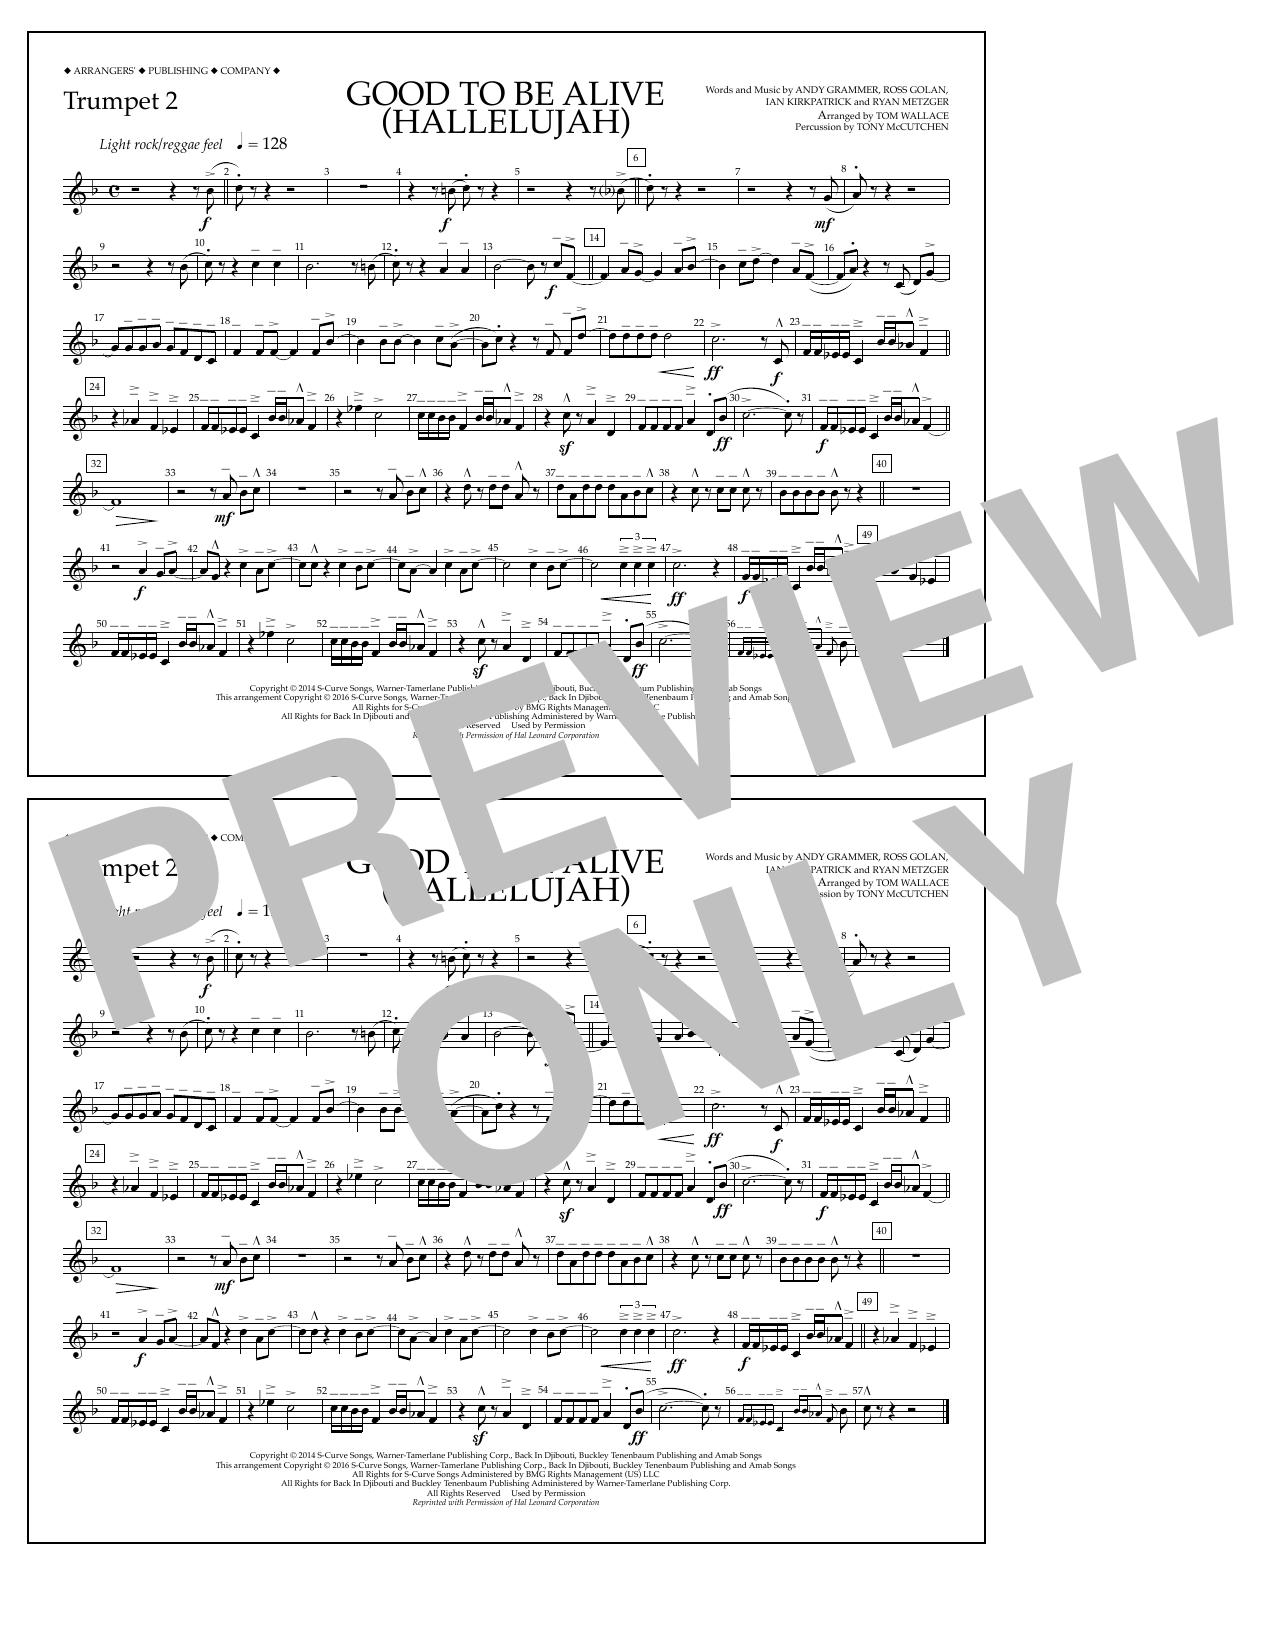 Andy Grammer - Good to Be Alive (Hallelujah) - Trumpet 2